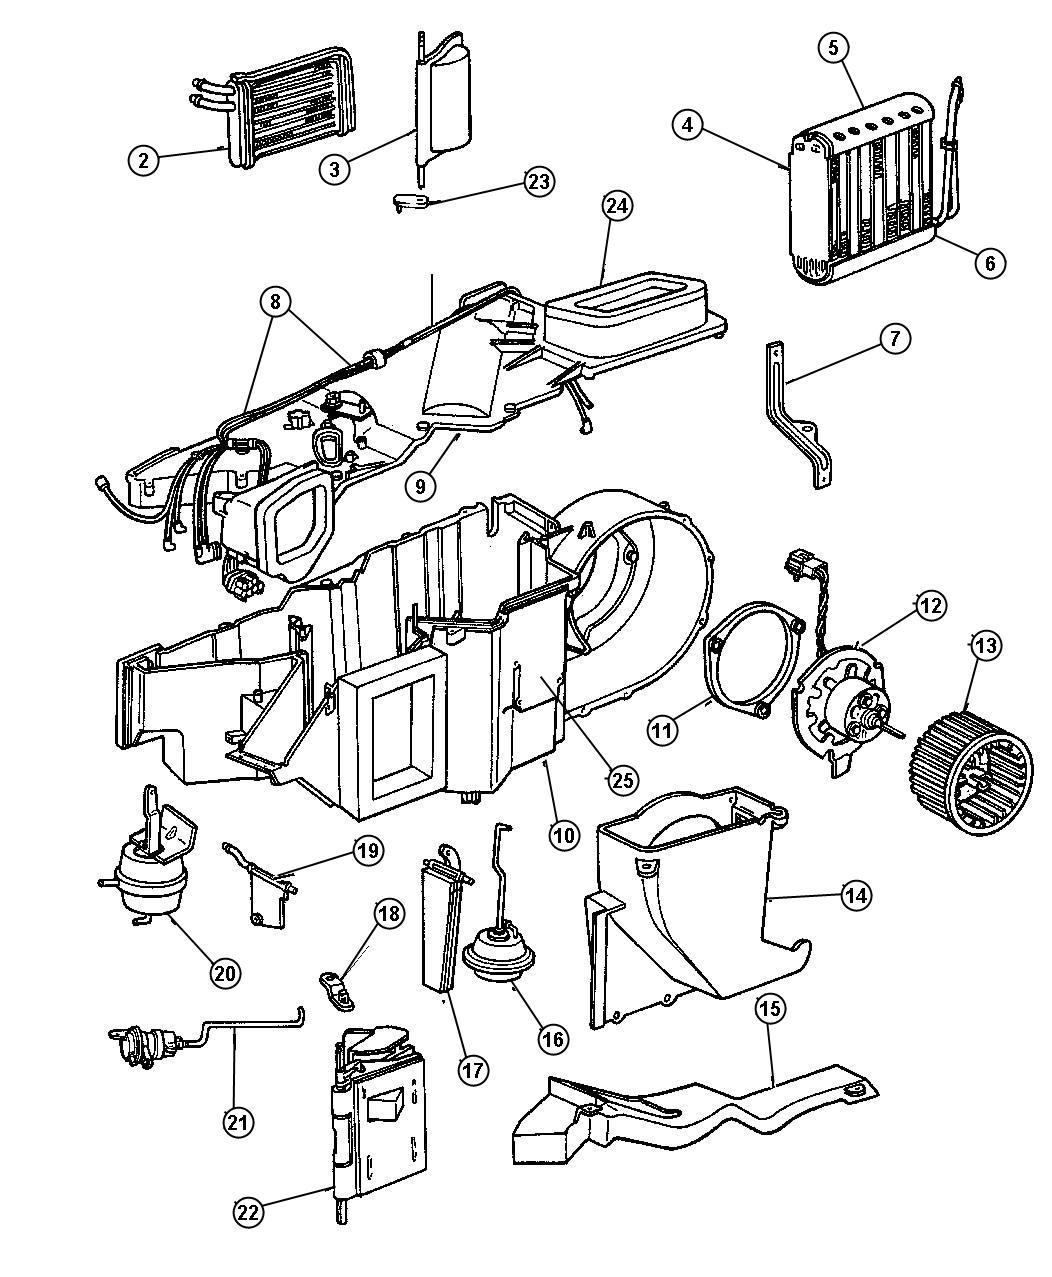 1998 dodge ram 1500 overhead console wiring diagram